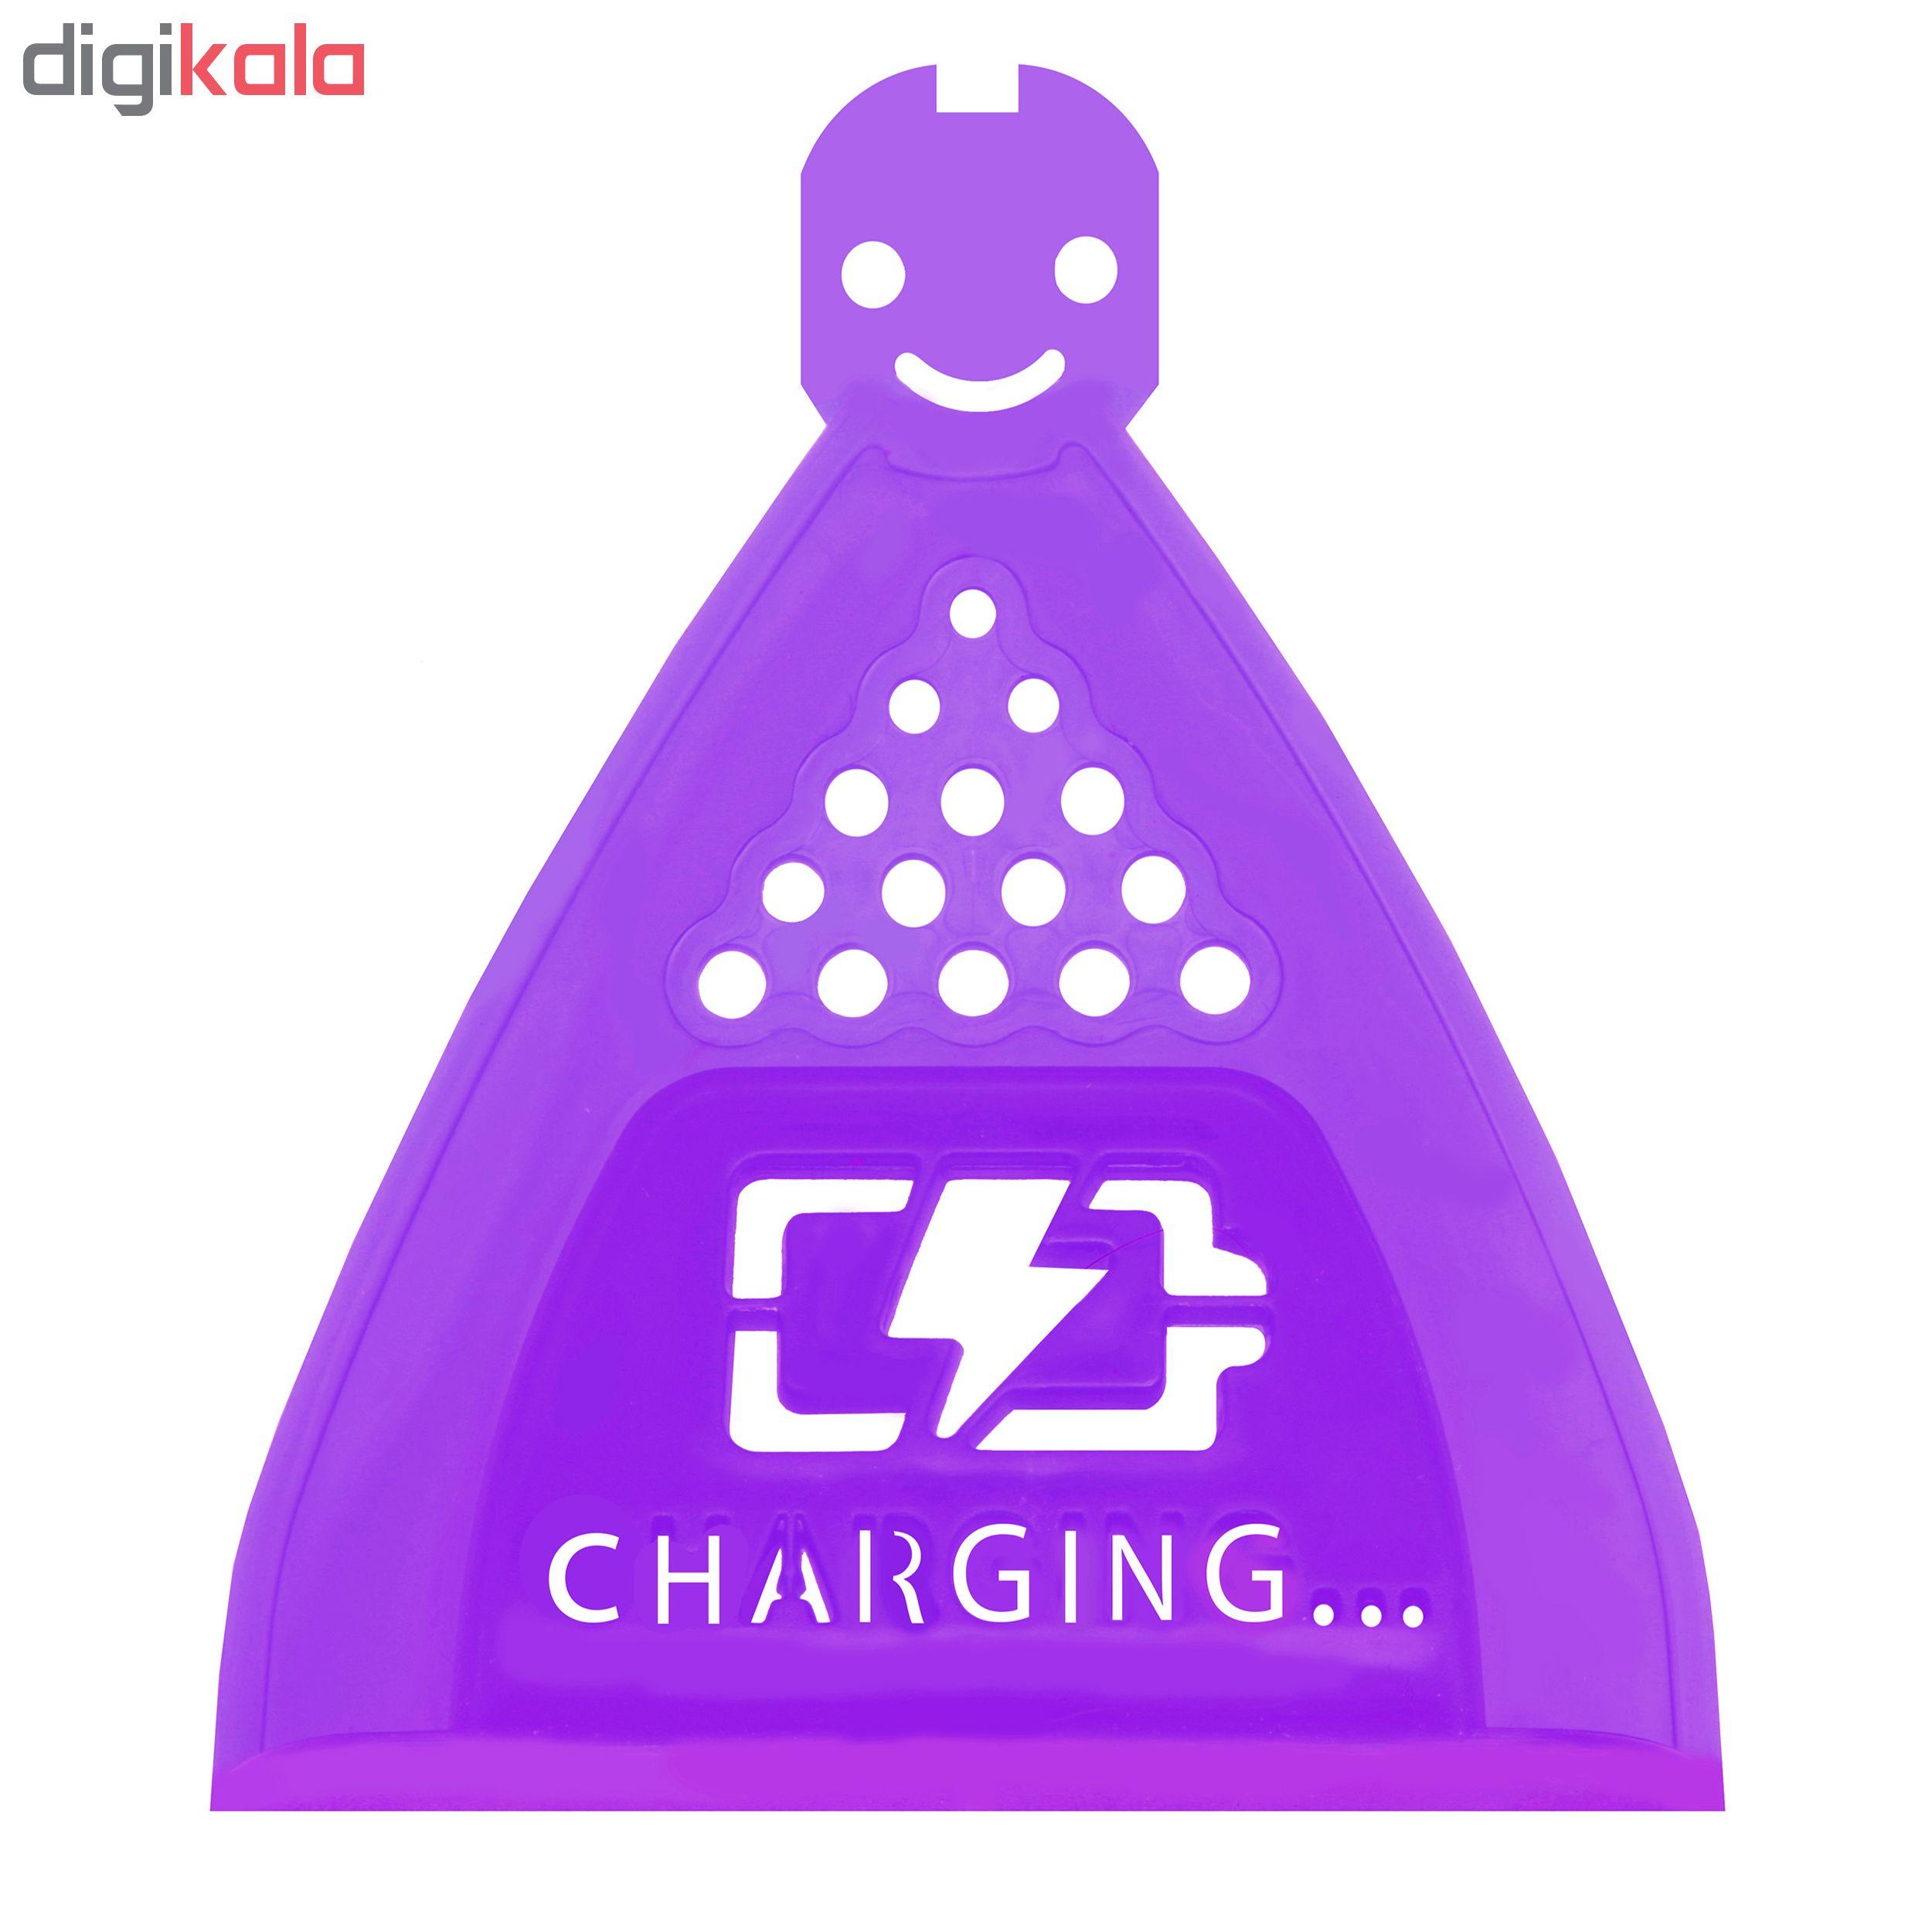 پایه نگهدارنده شارژر موبایل مدل Hng 0229 main 1 14